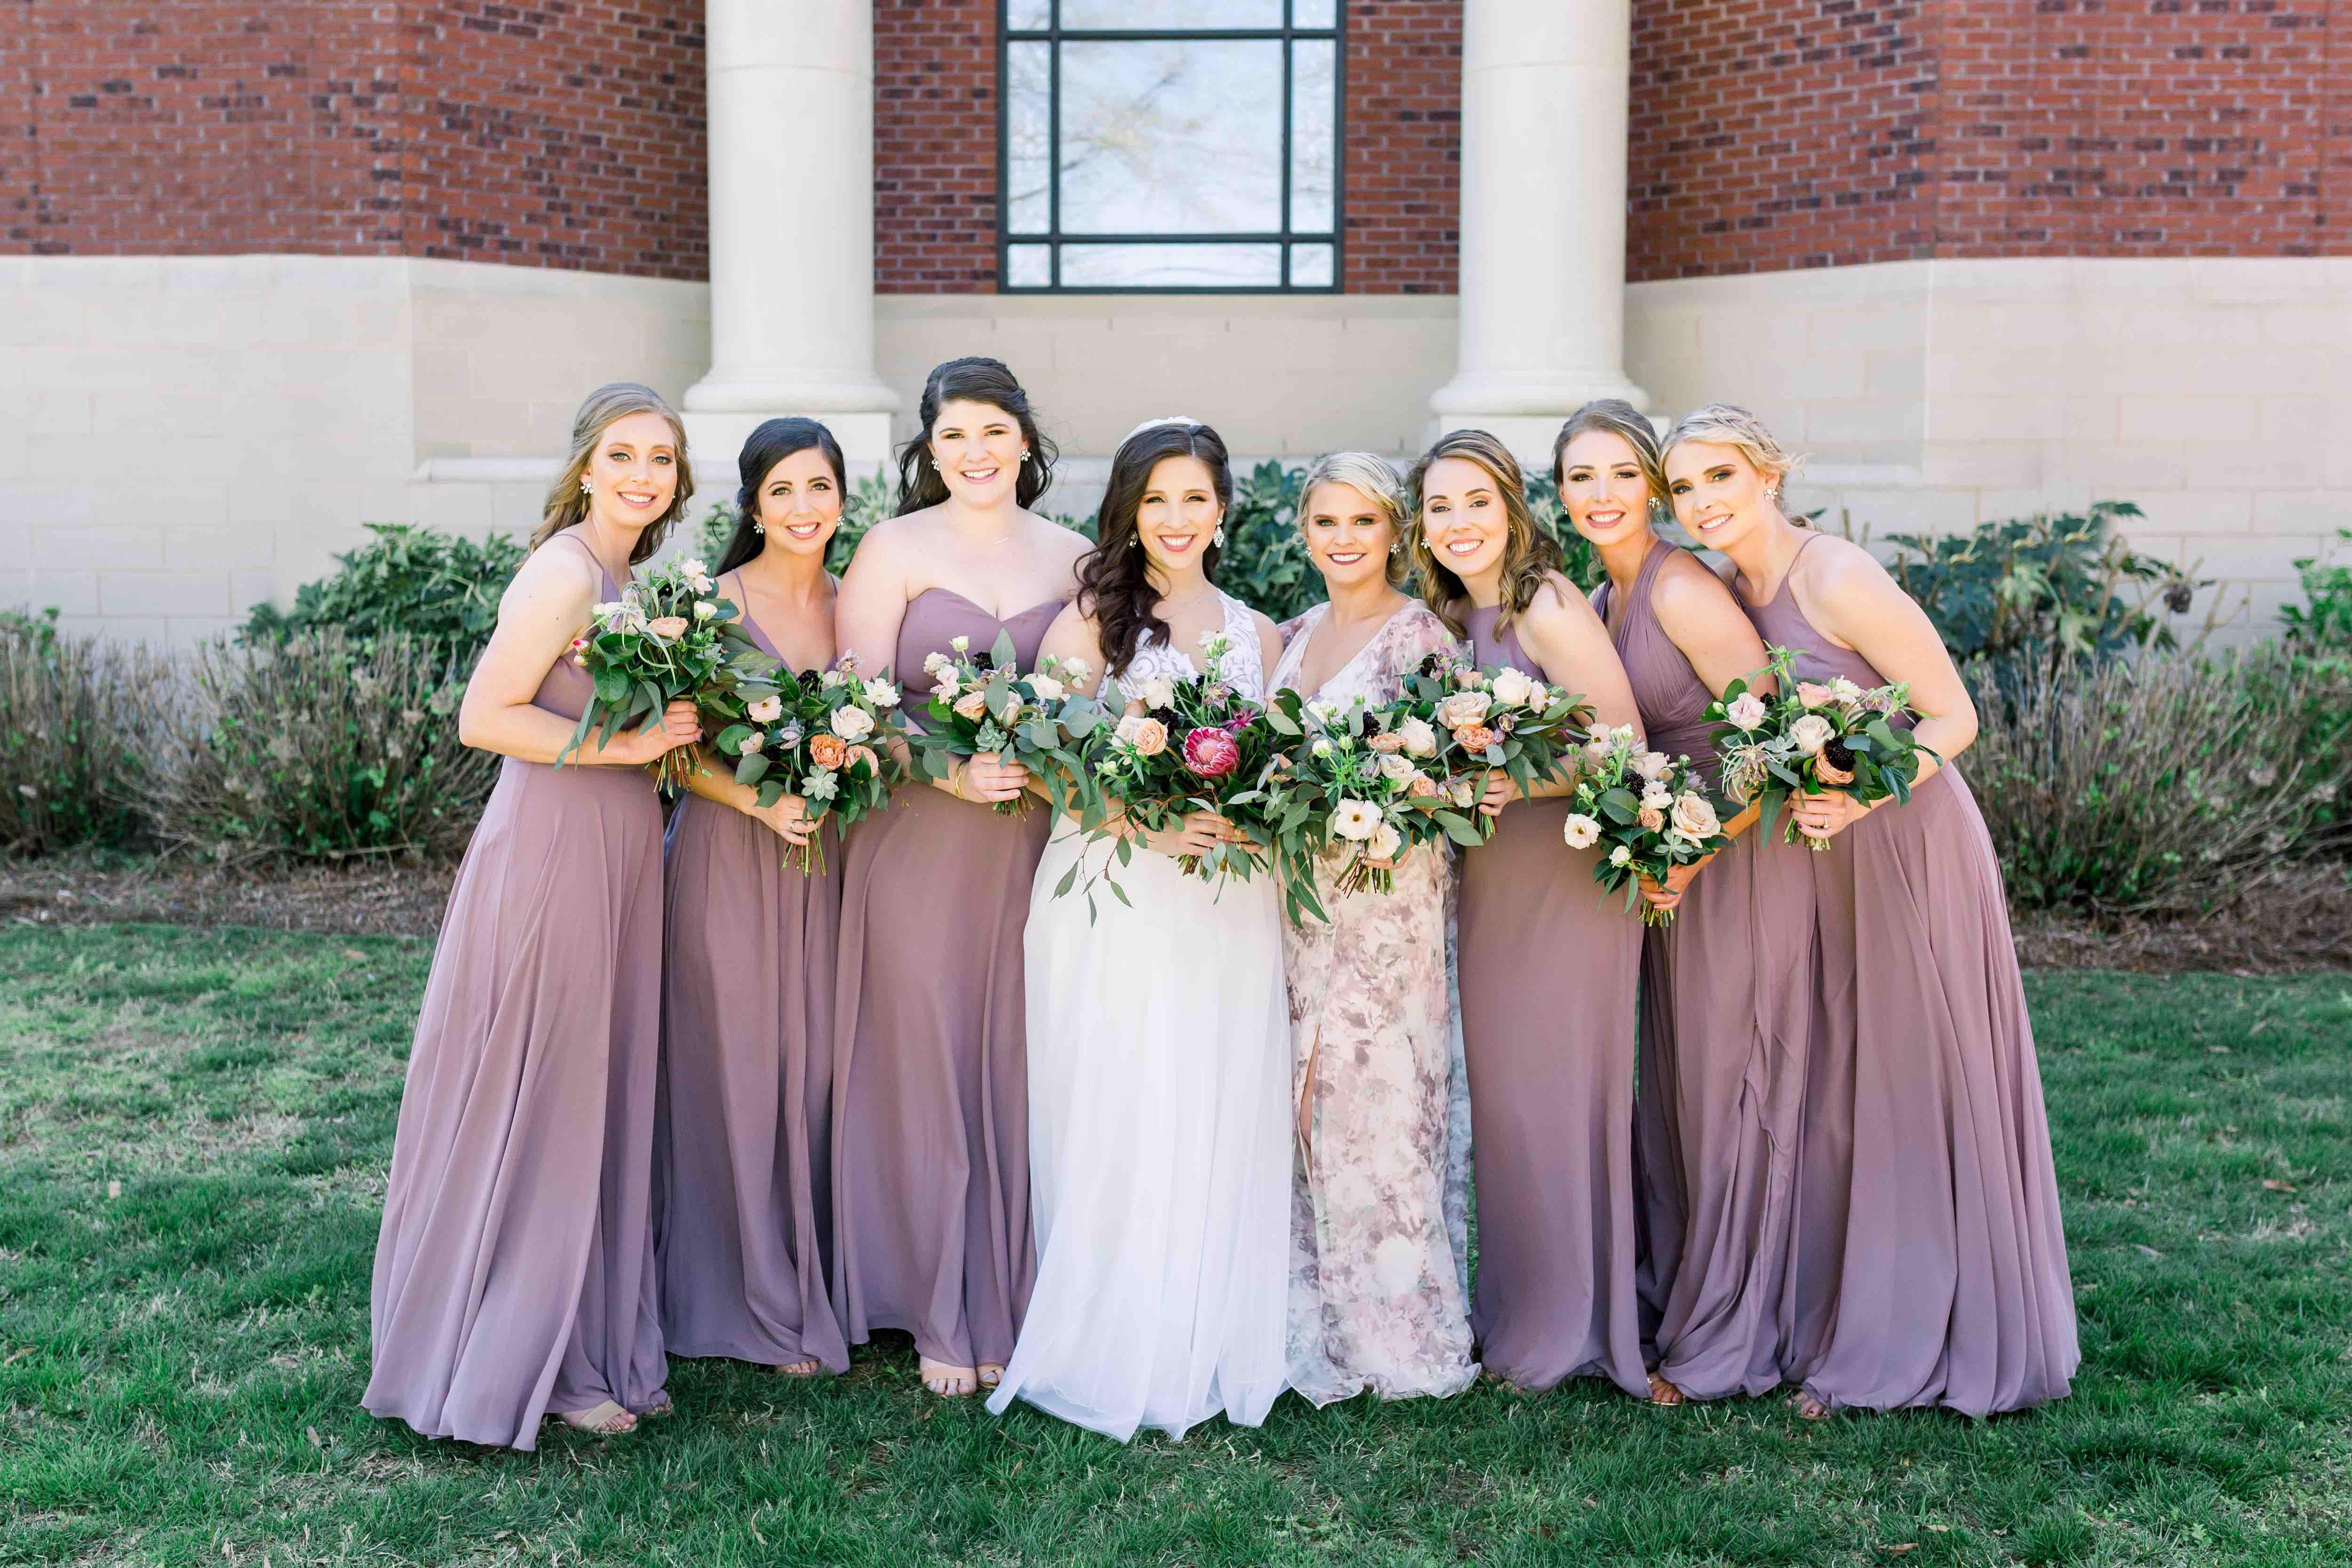 inspiration guide bridesmaids dresses